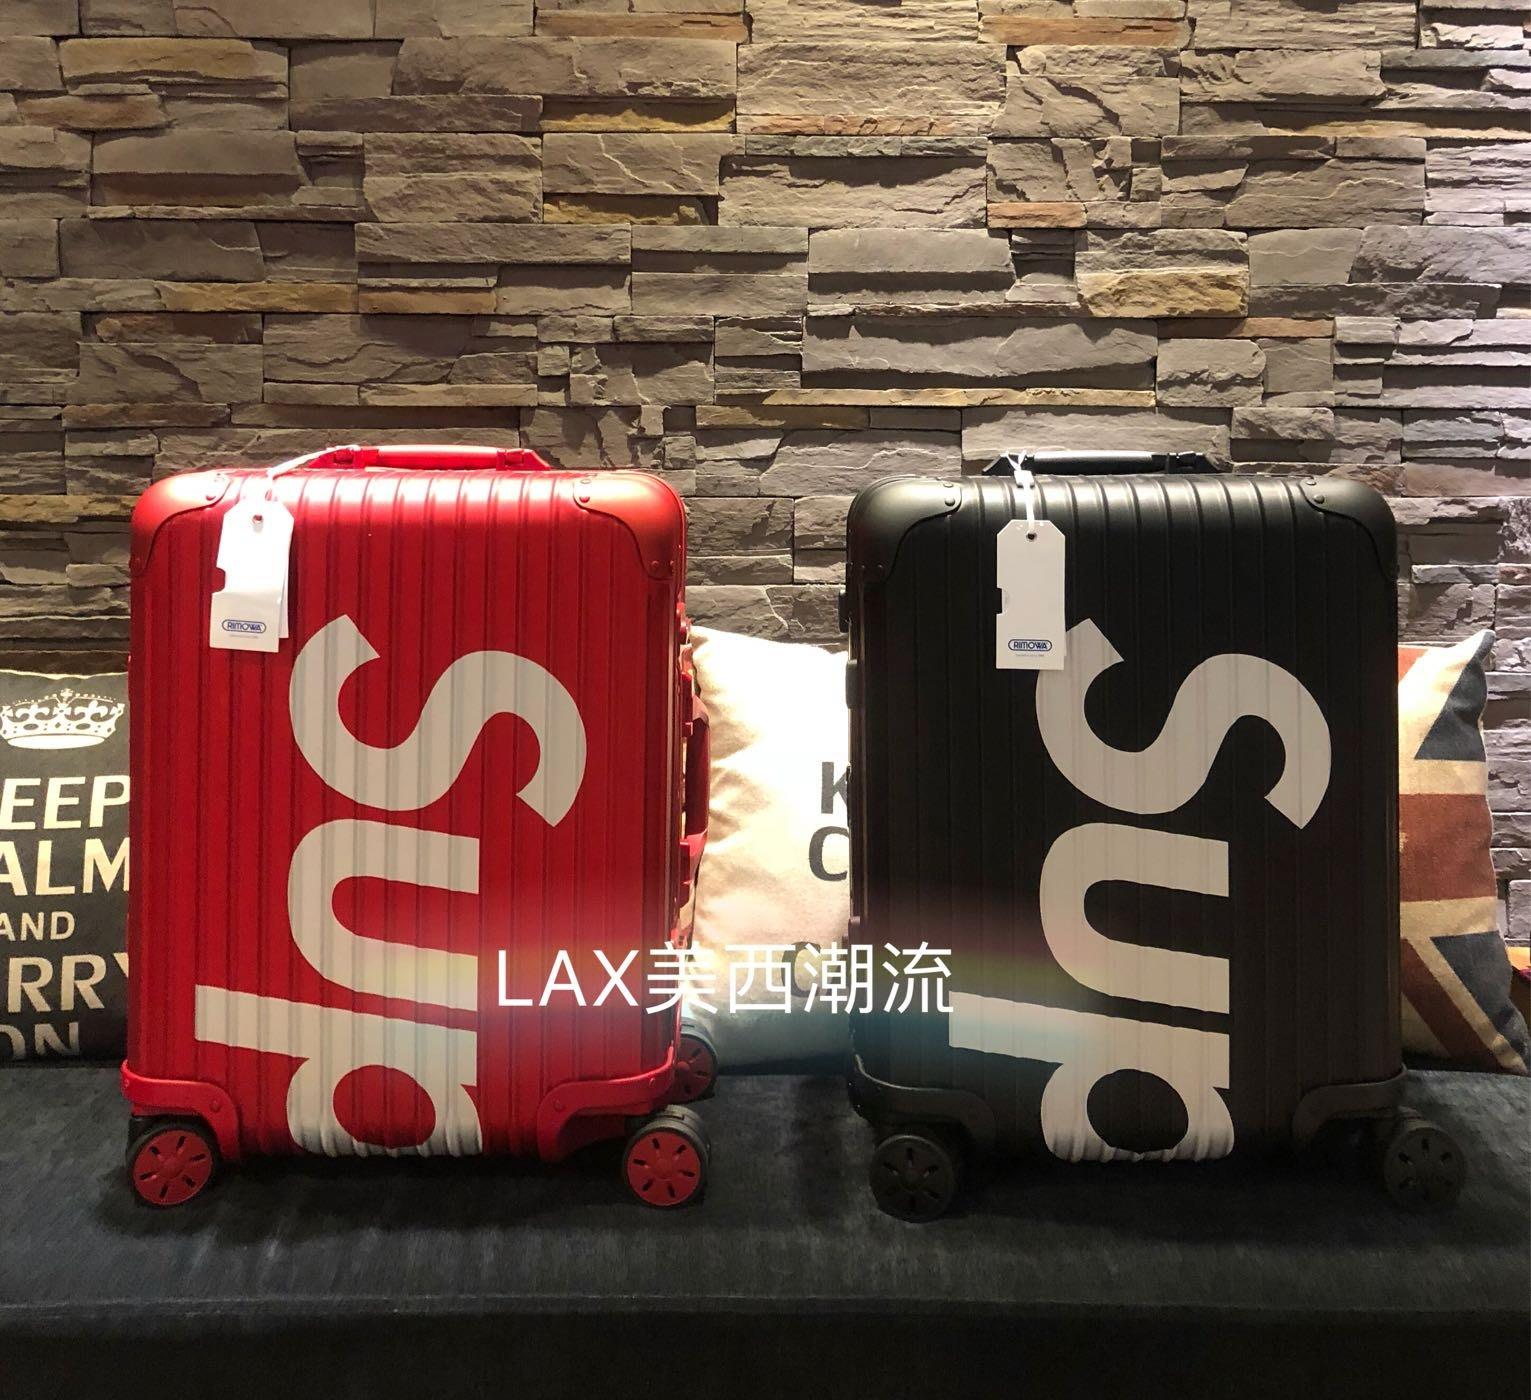 【LAX美西潮流】100%全新真品 Supreme X Rimowa  45L登機箱 ,歡迎詢問 實品超美